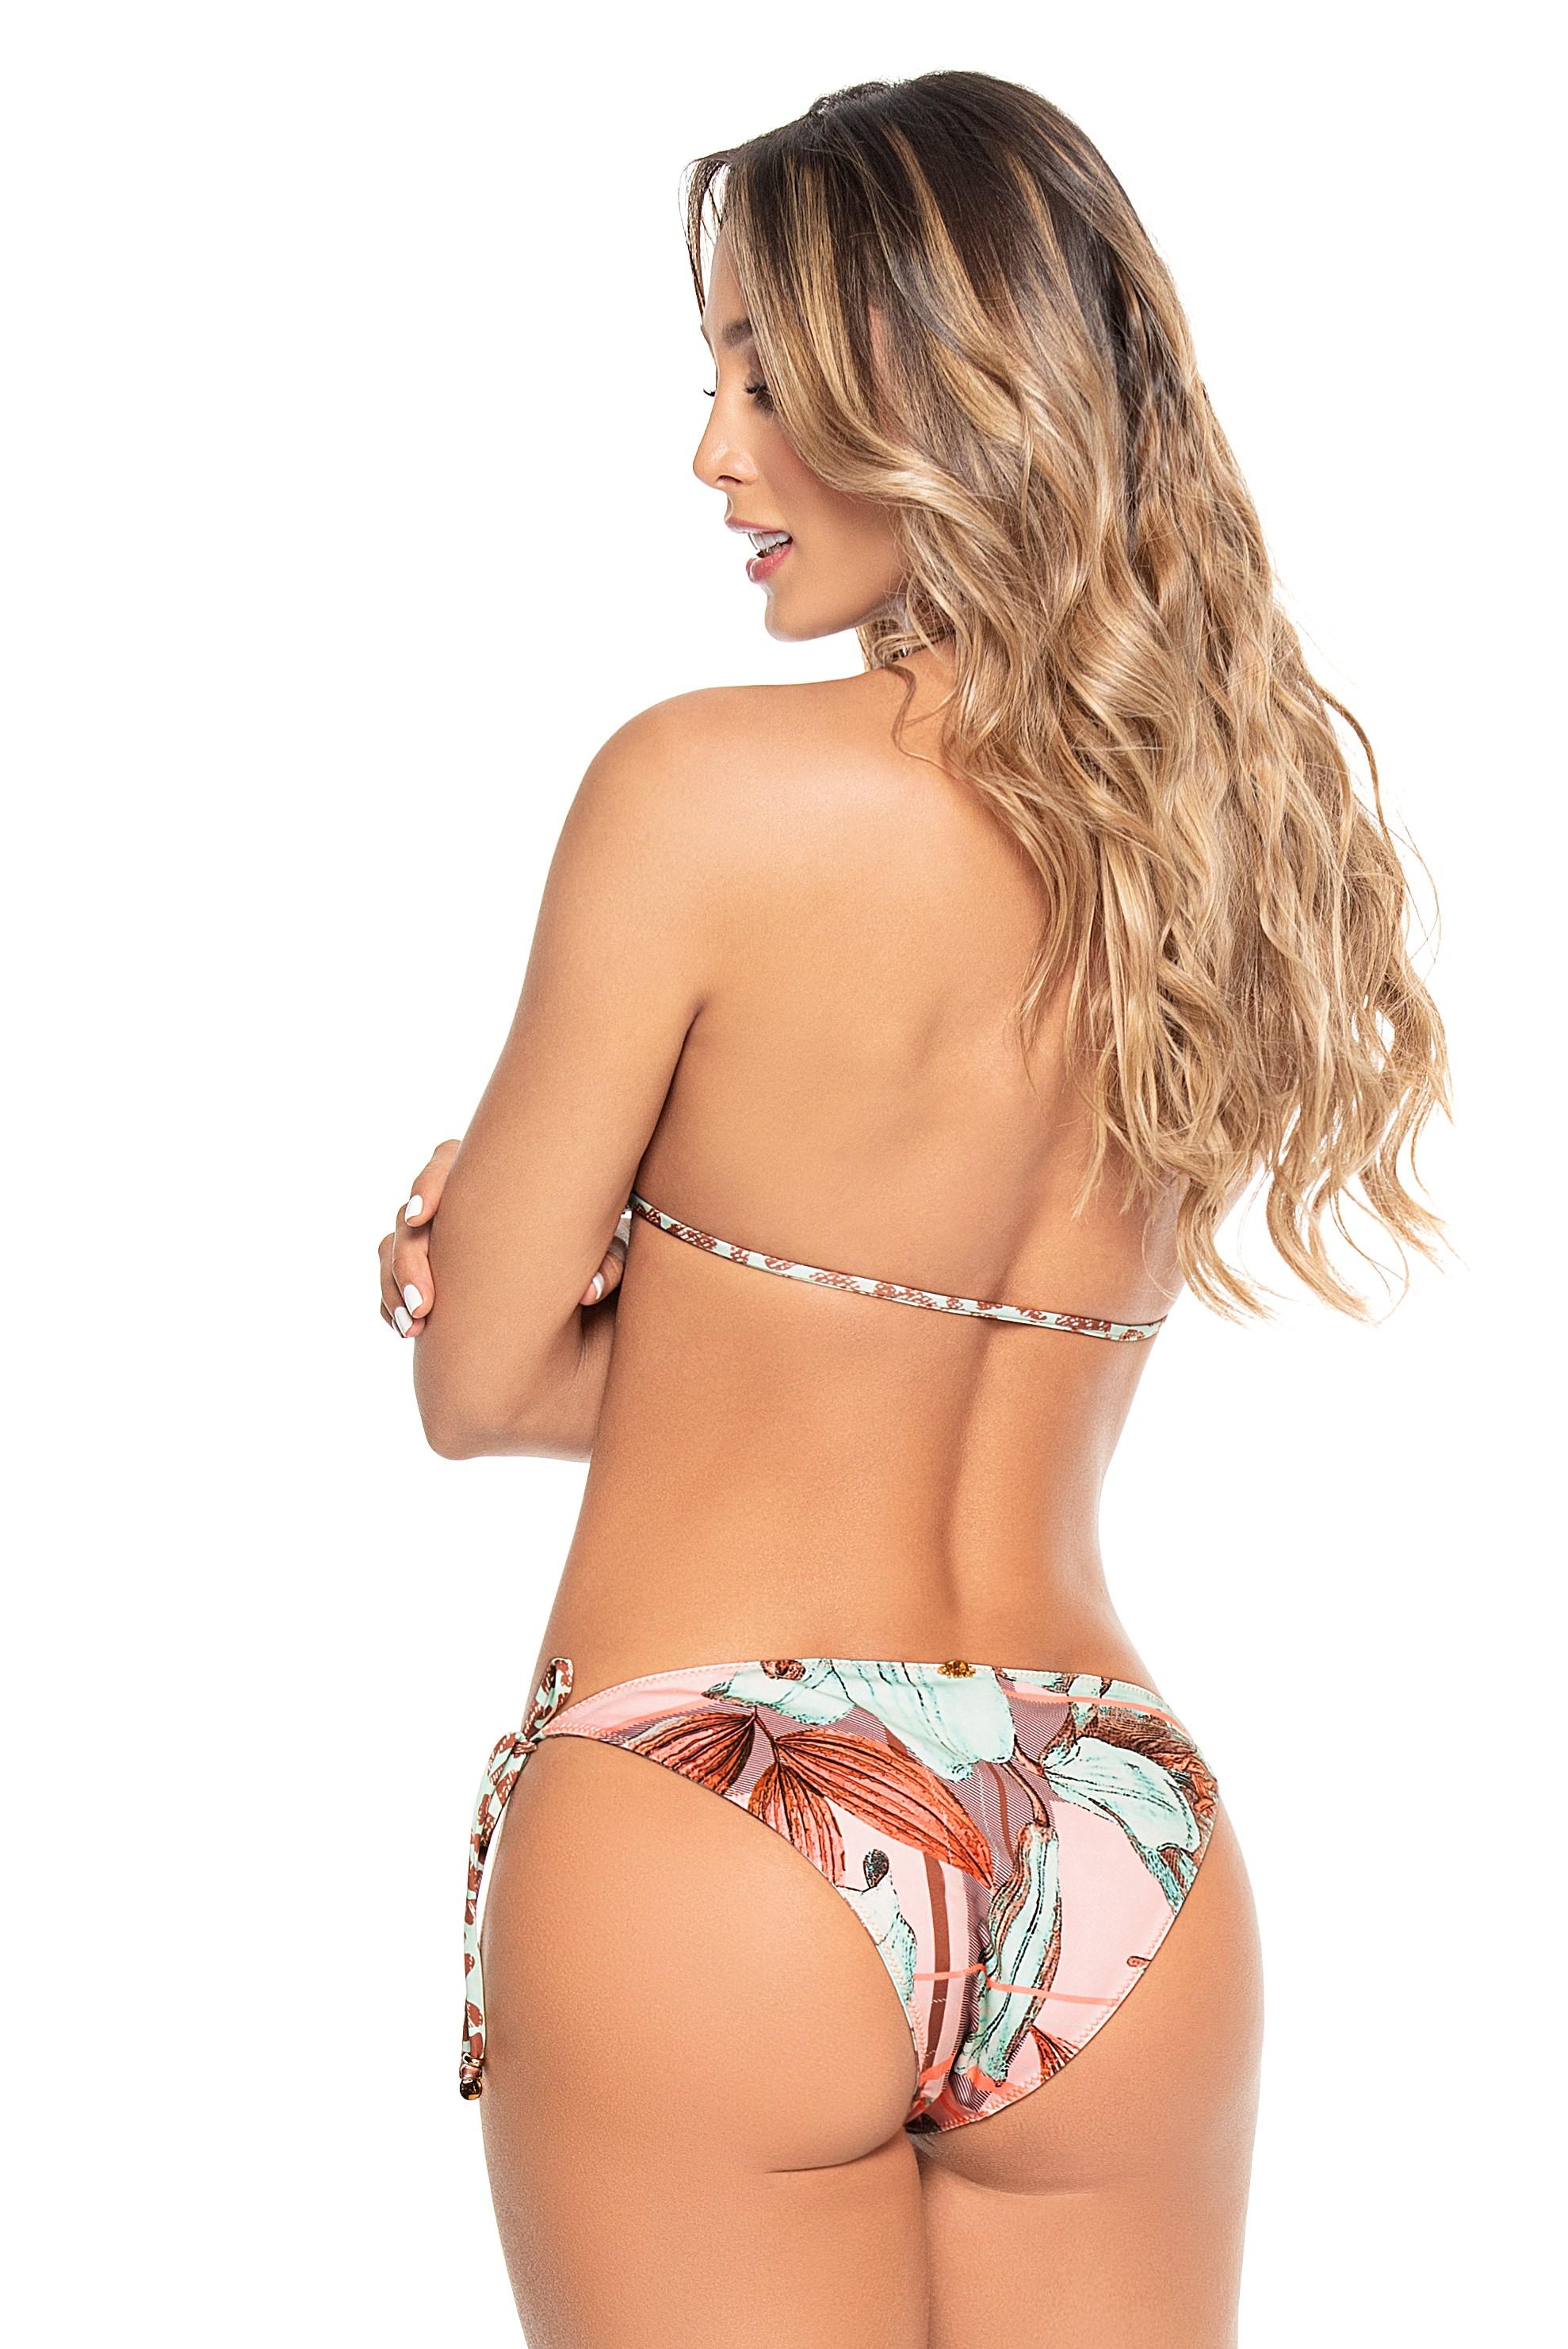 Phax Bella Africa Triangel tie side bikini